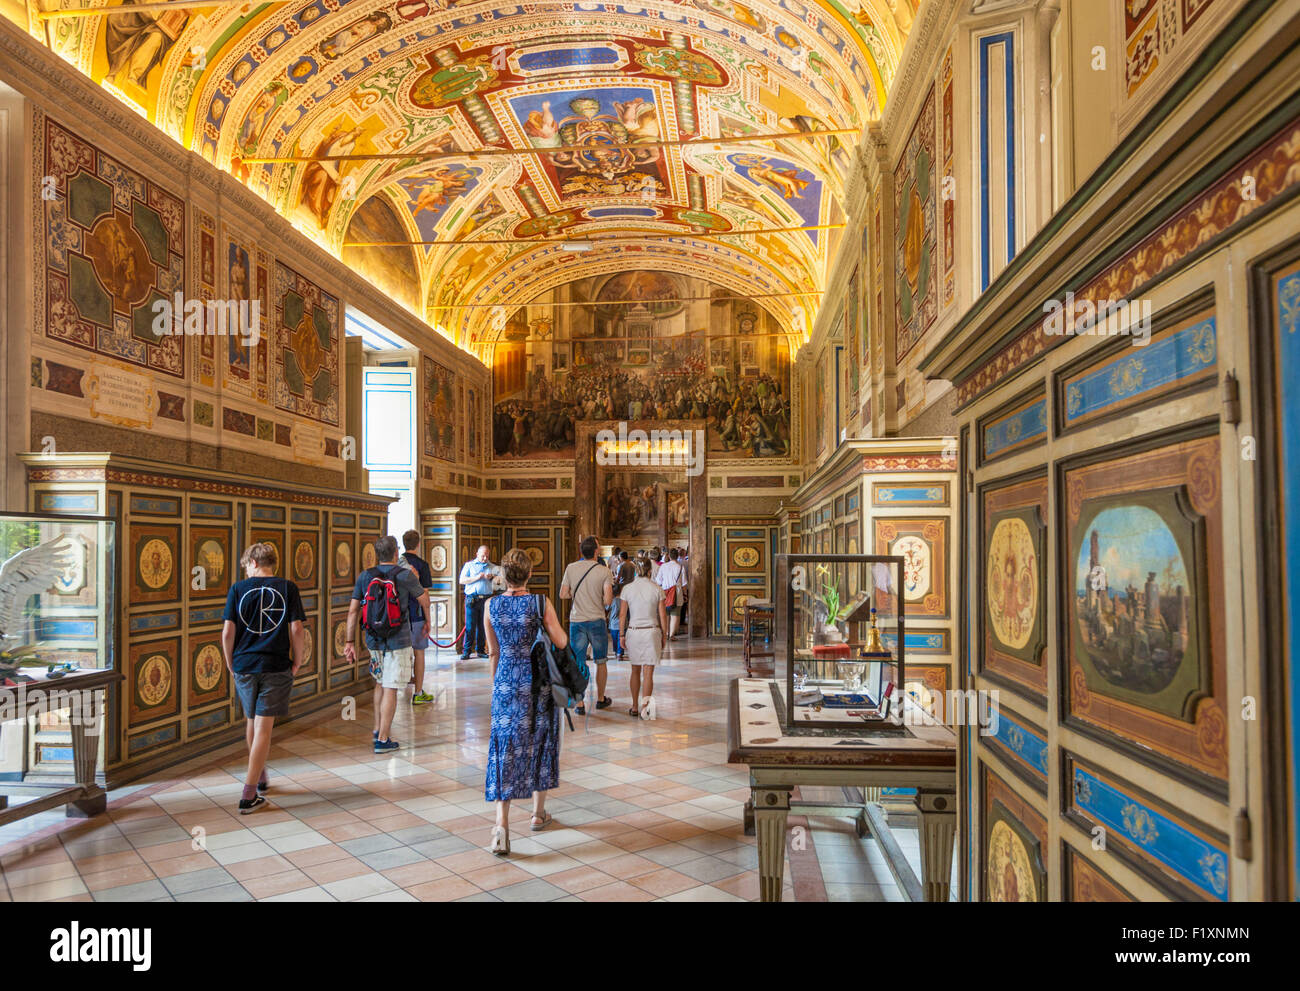 inside-the-galleries-of-the-vatican-museum-interior-vatican-city-rome-F1XNMN.jpg